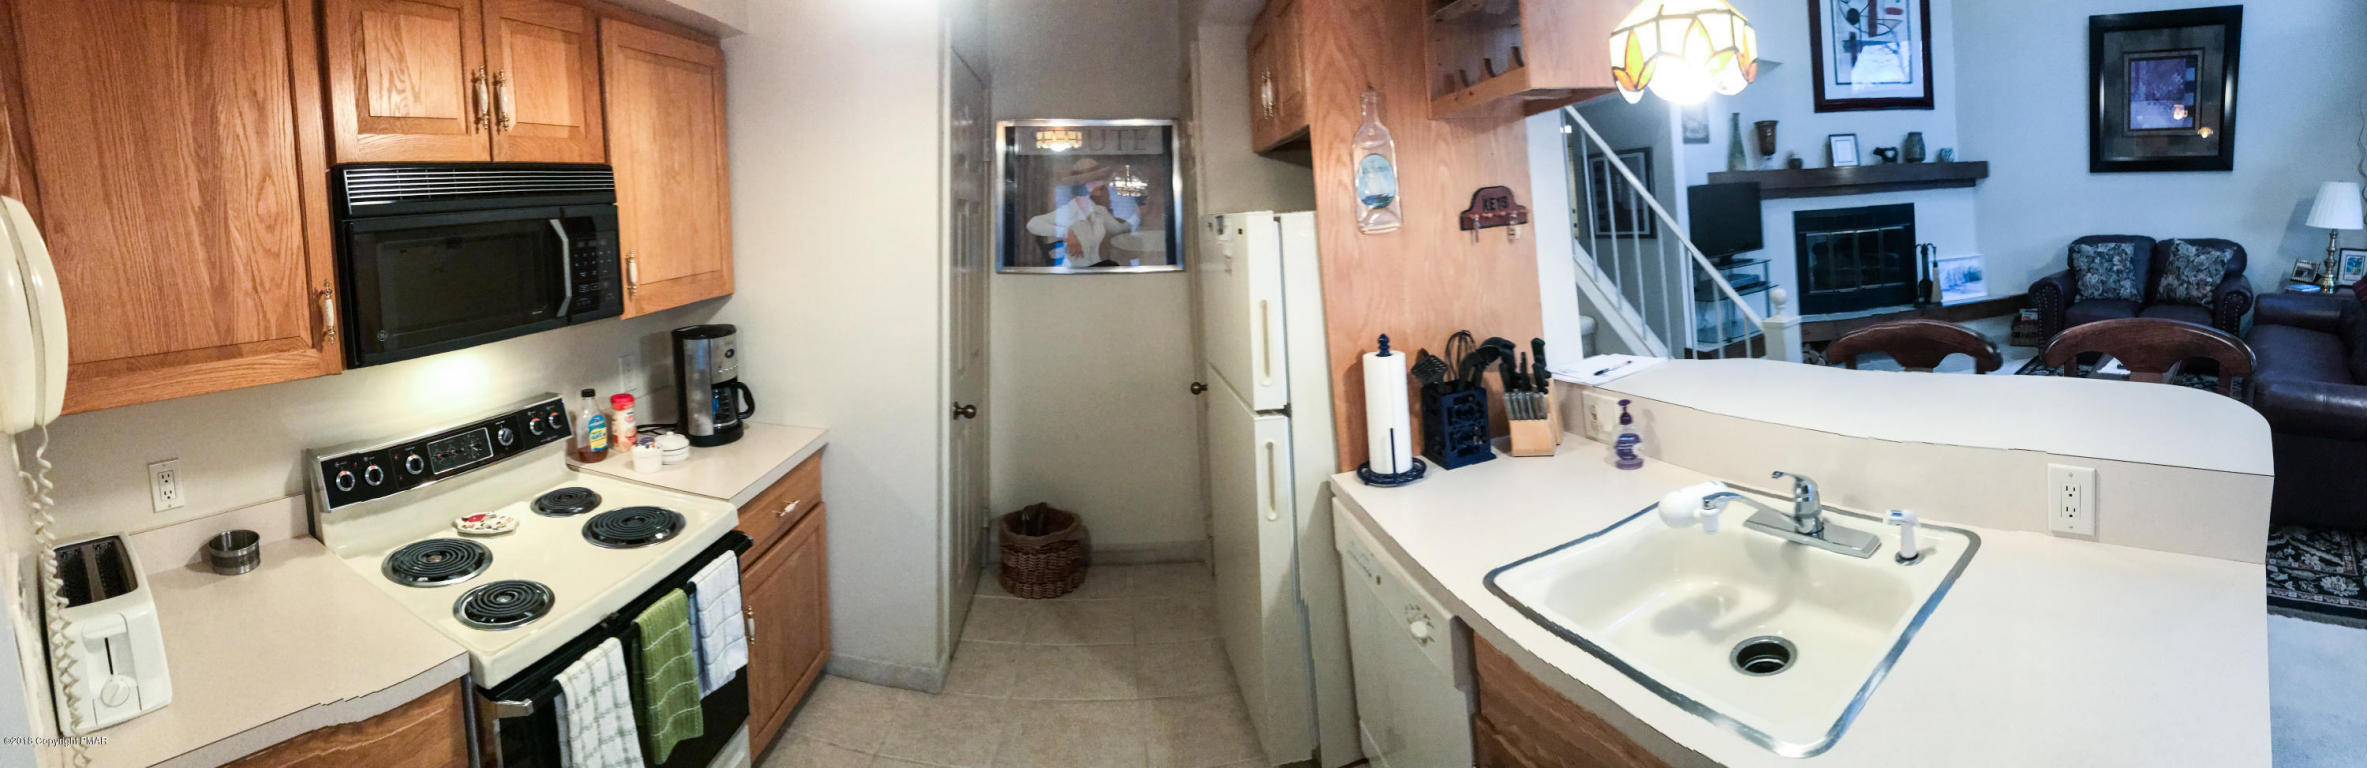 61 Bld Midlake Unit 302 Dr, Lake Harmony, PA 18624